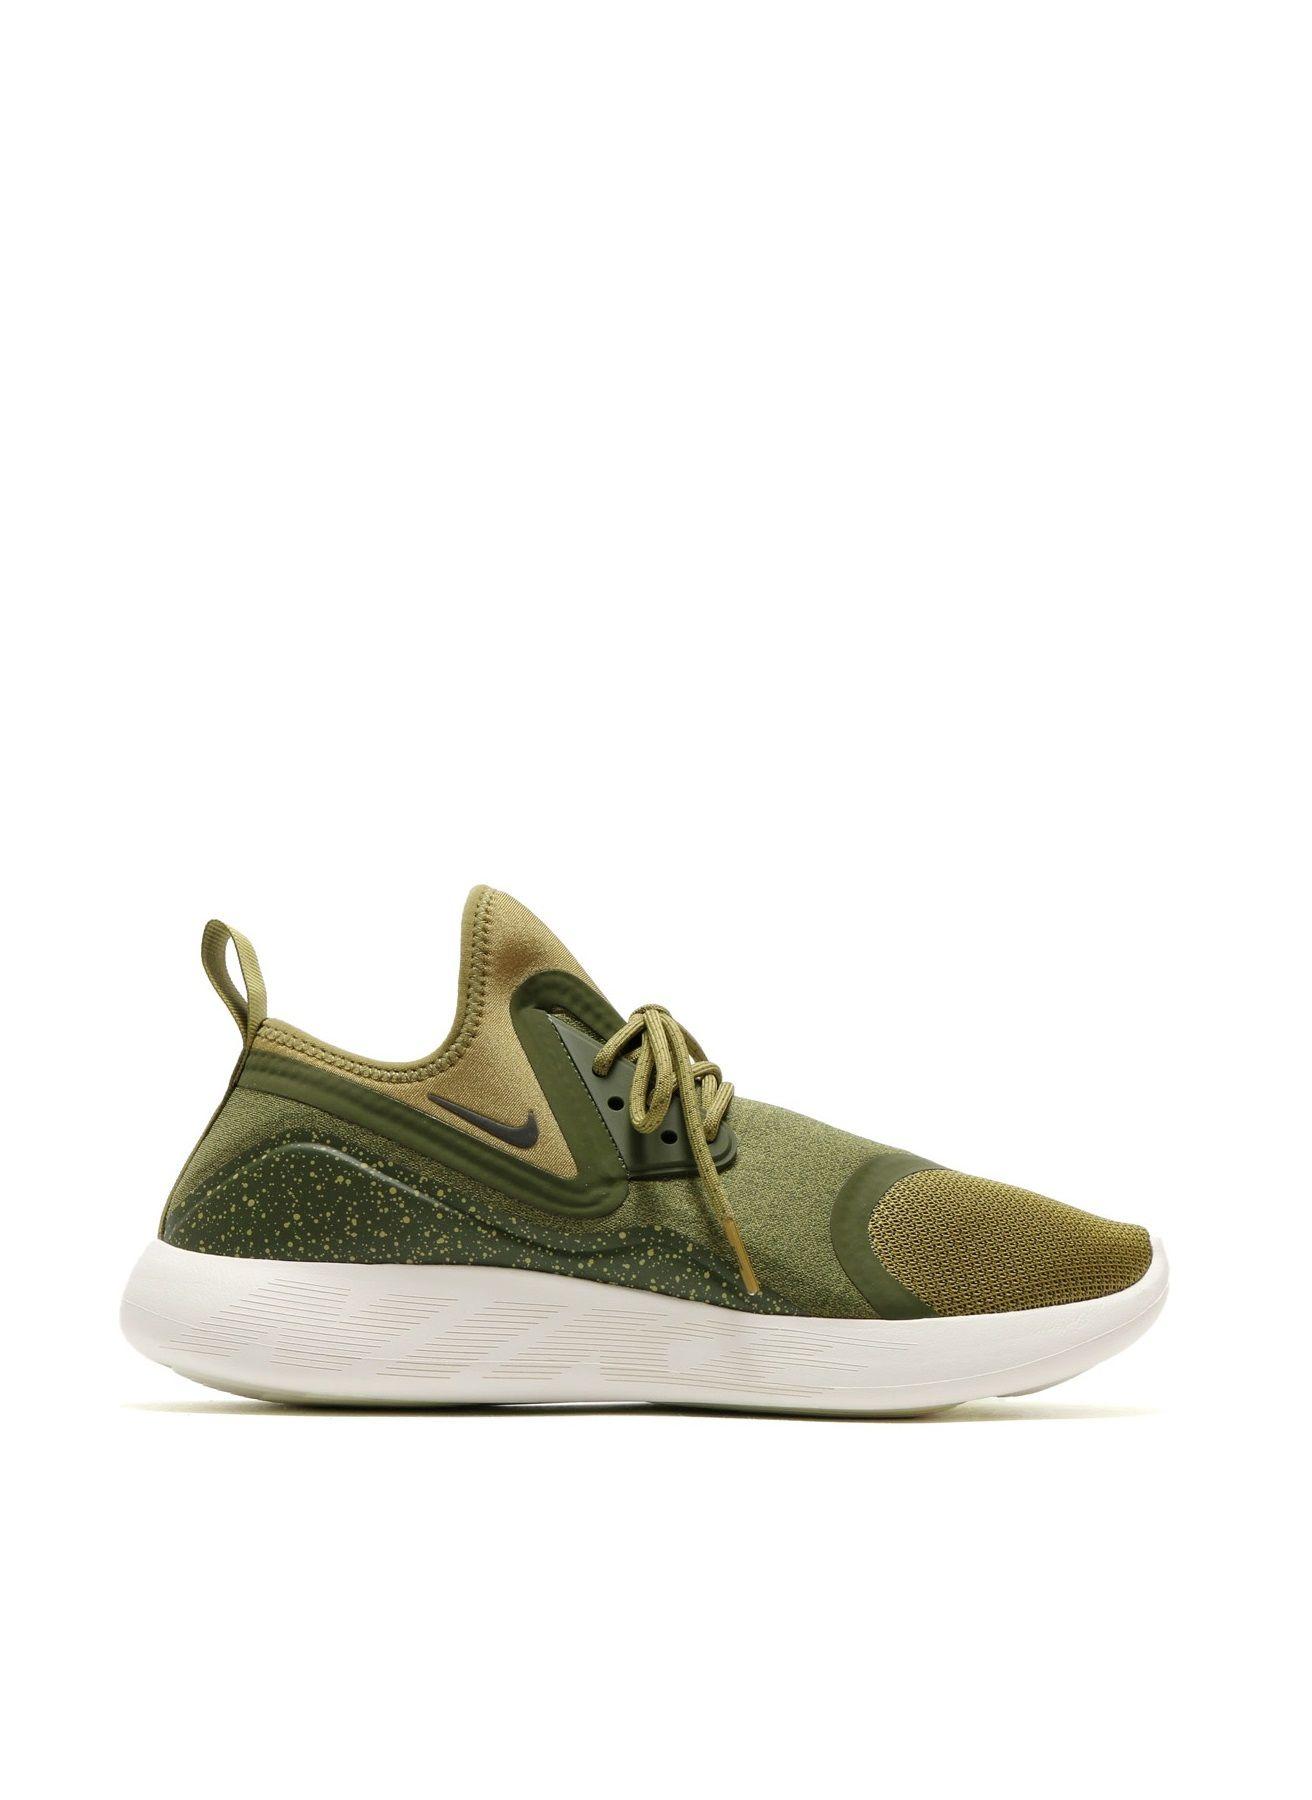 Nike Lunarcharge: Camper Green